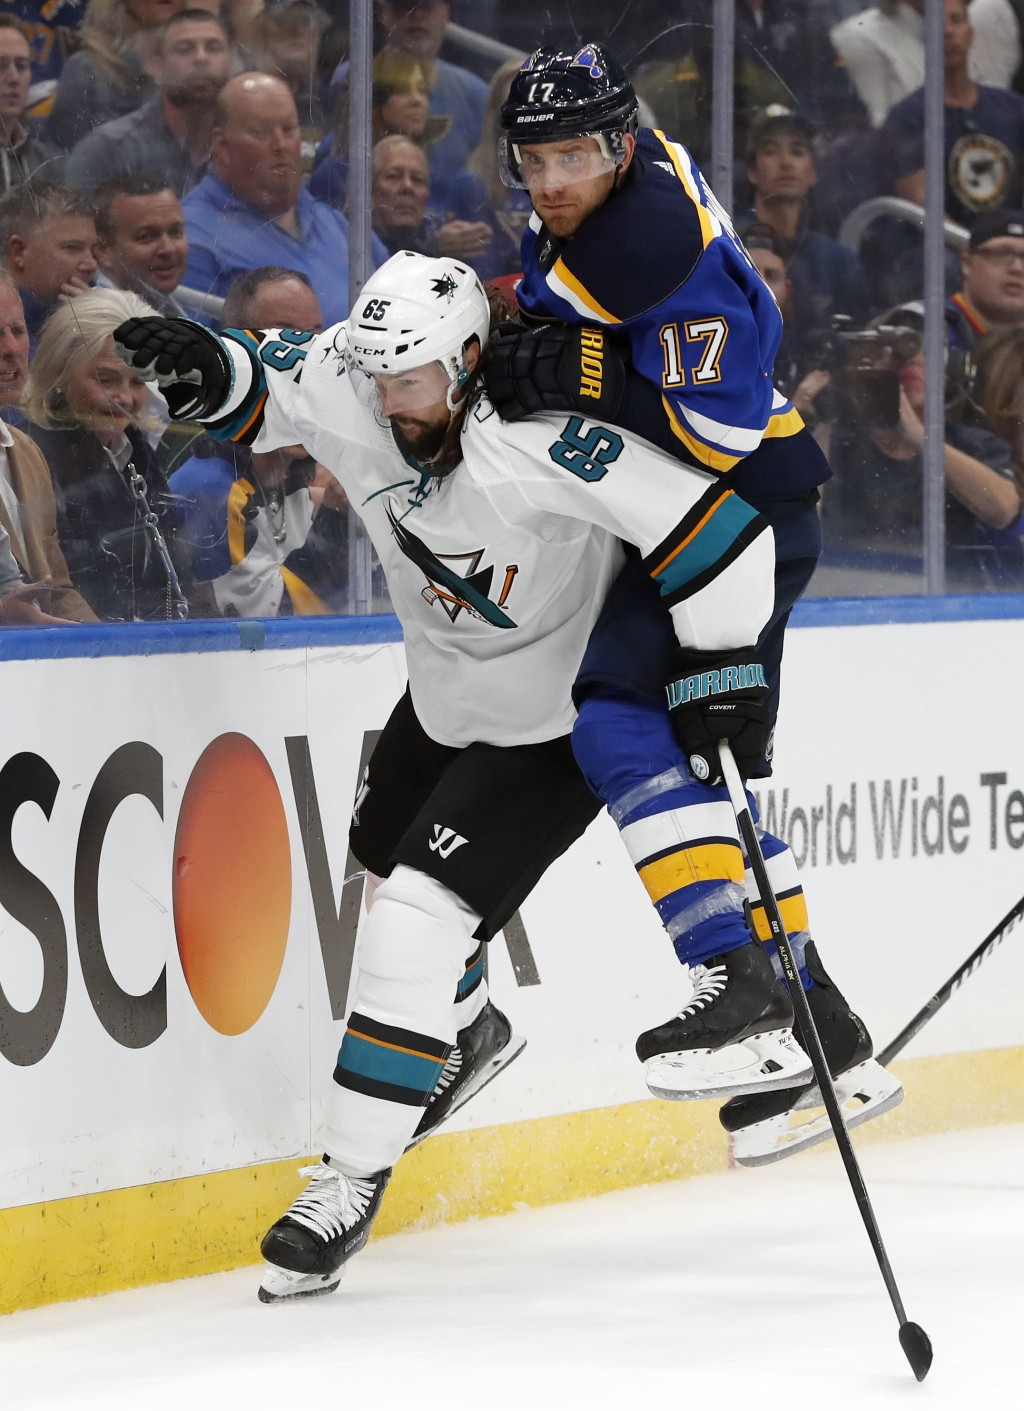 St. Louis Blues left wing Jaden Schwartz (17) lands on the back of San Jose Sharks defenseman Erik Karlsson (65), of Sweden, during the third period i...